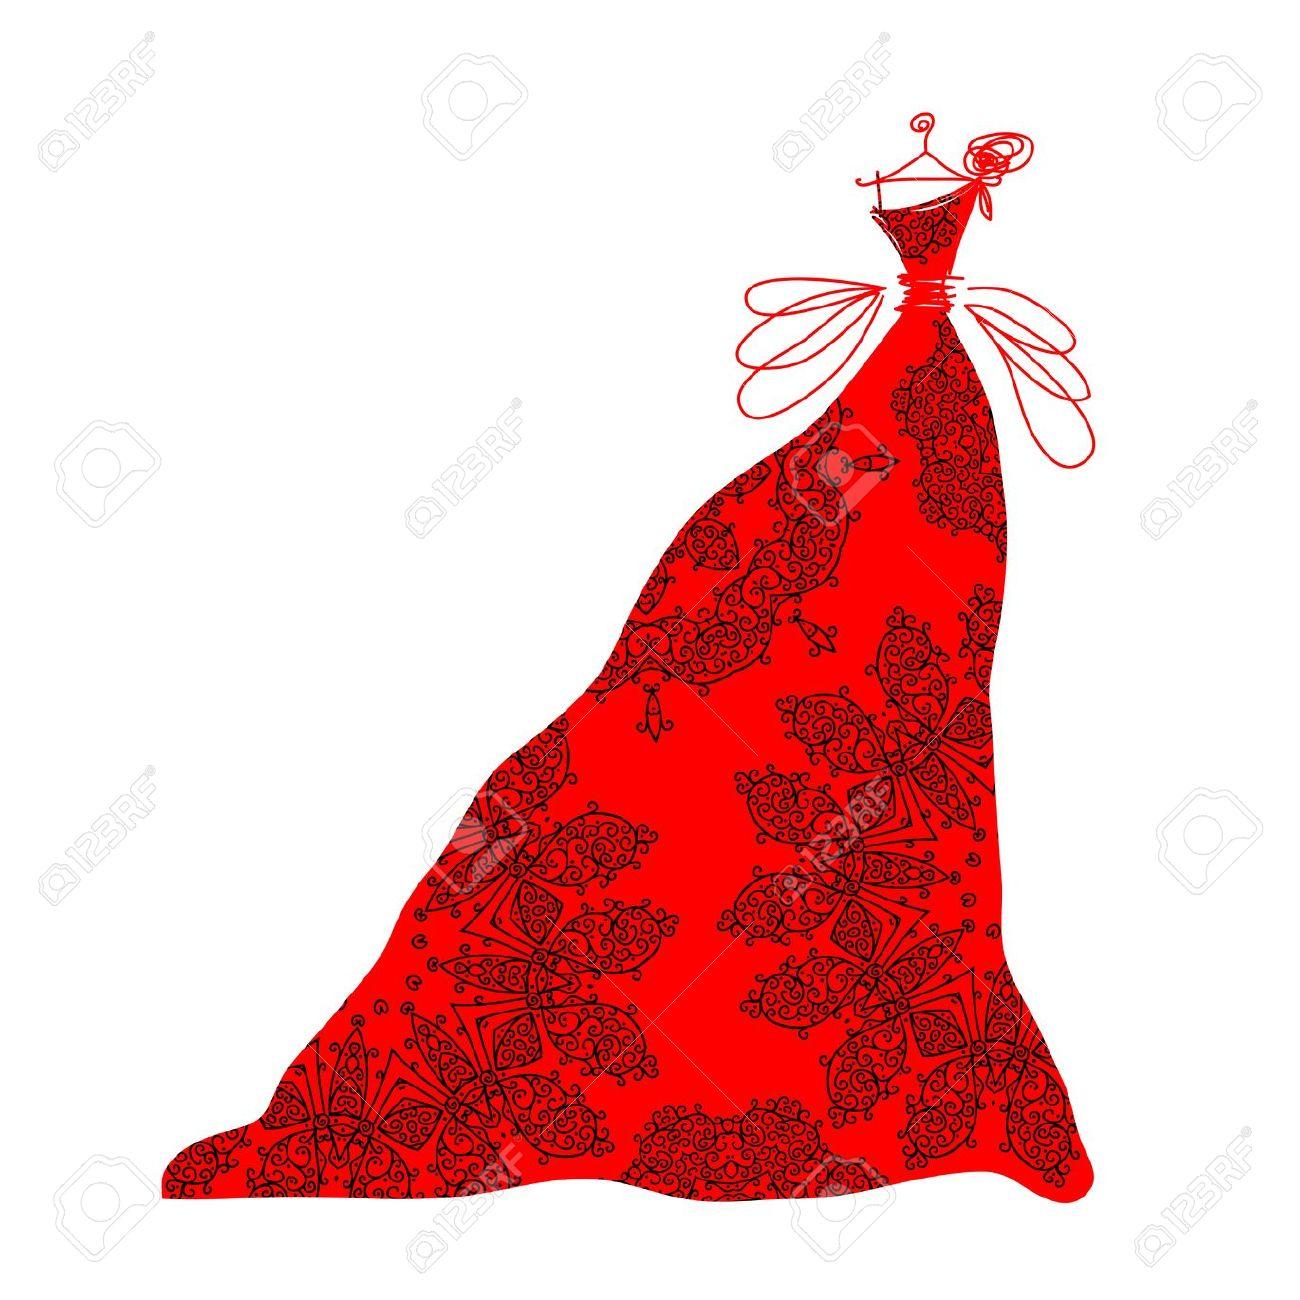 Red Dinner Dress Clipart.